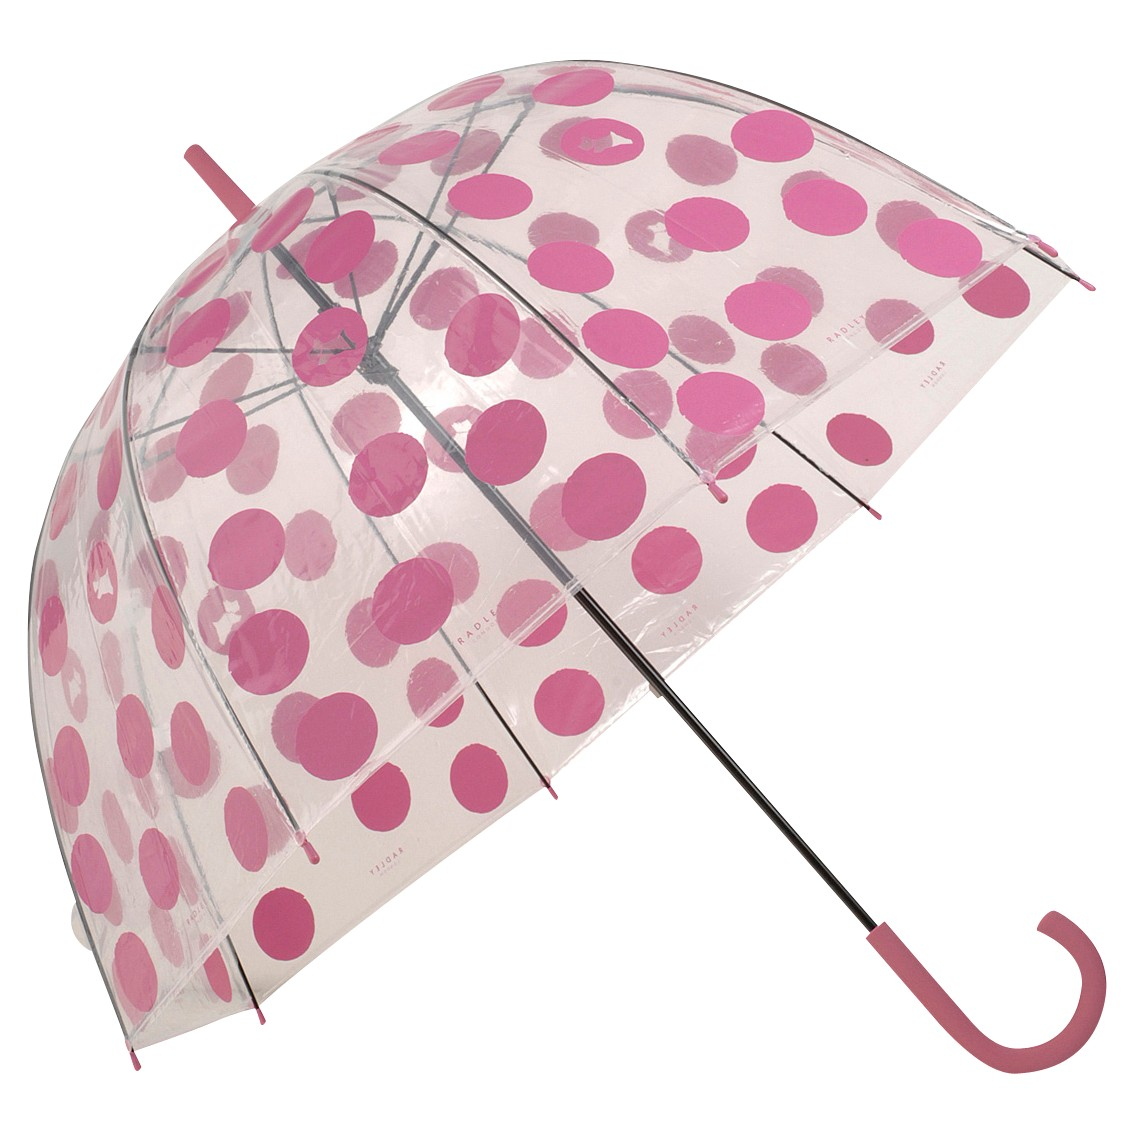 Totes Polka Dot Umbrella